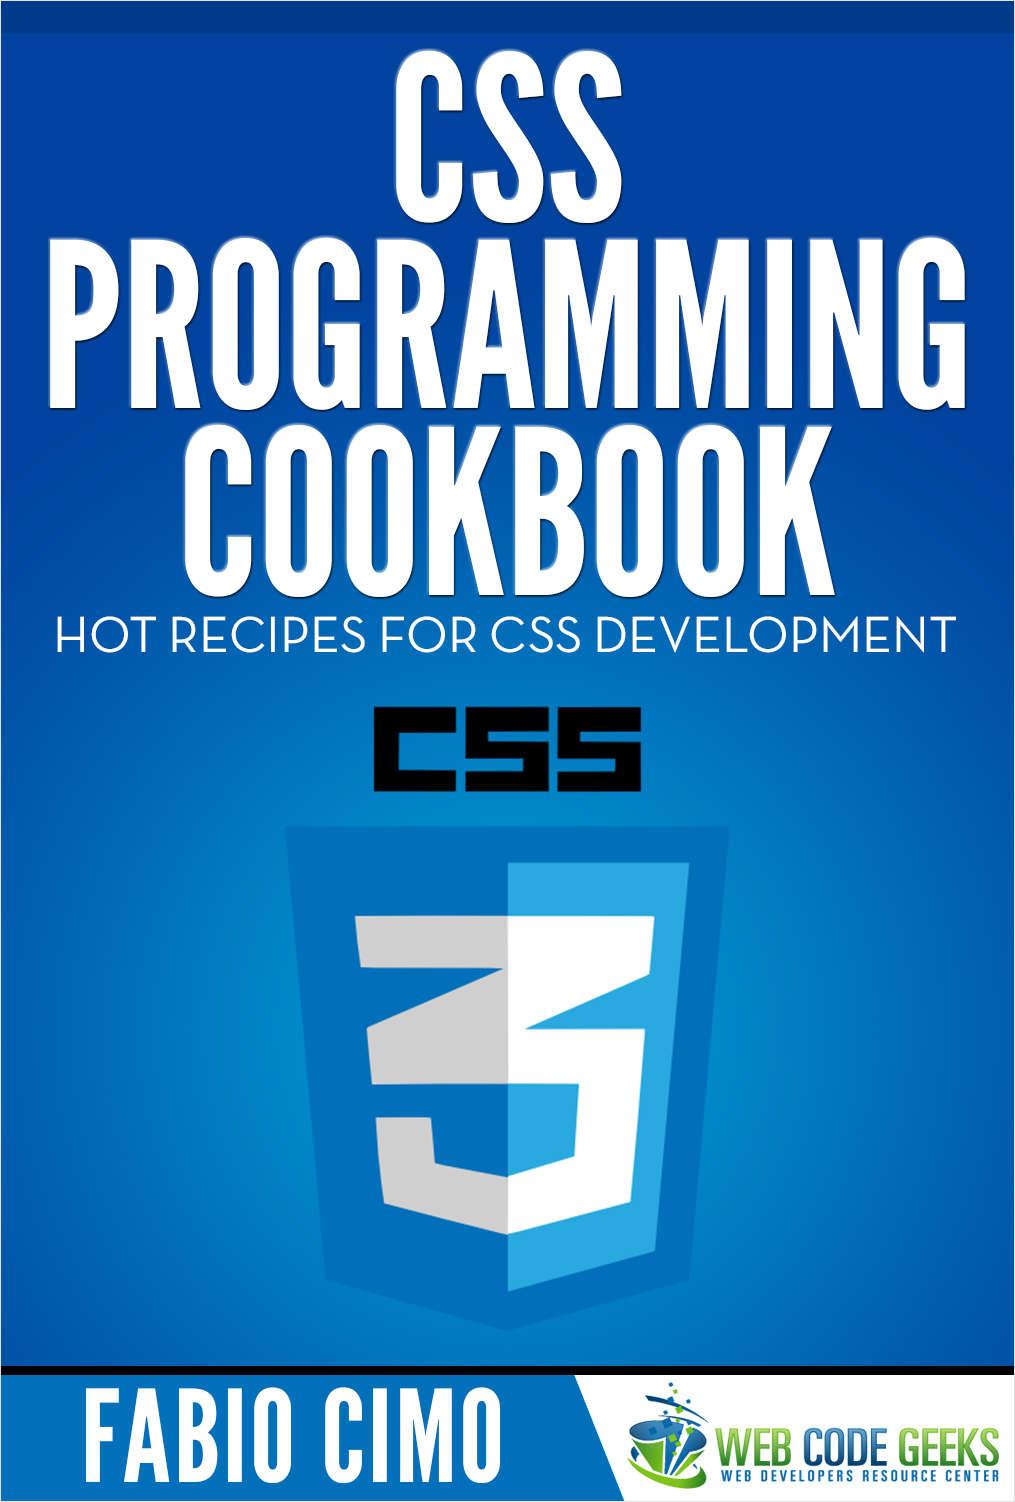 CSS Programming Cookbook